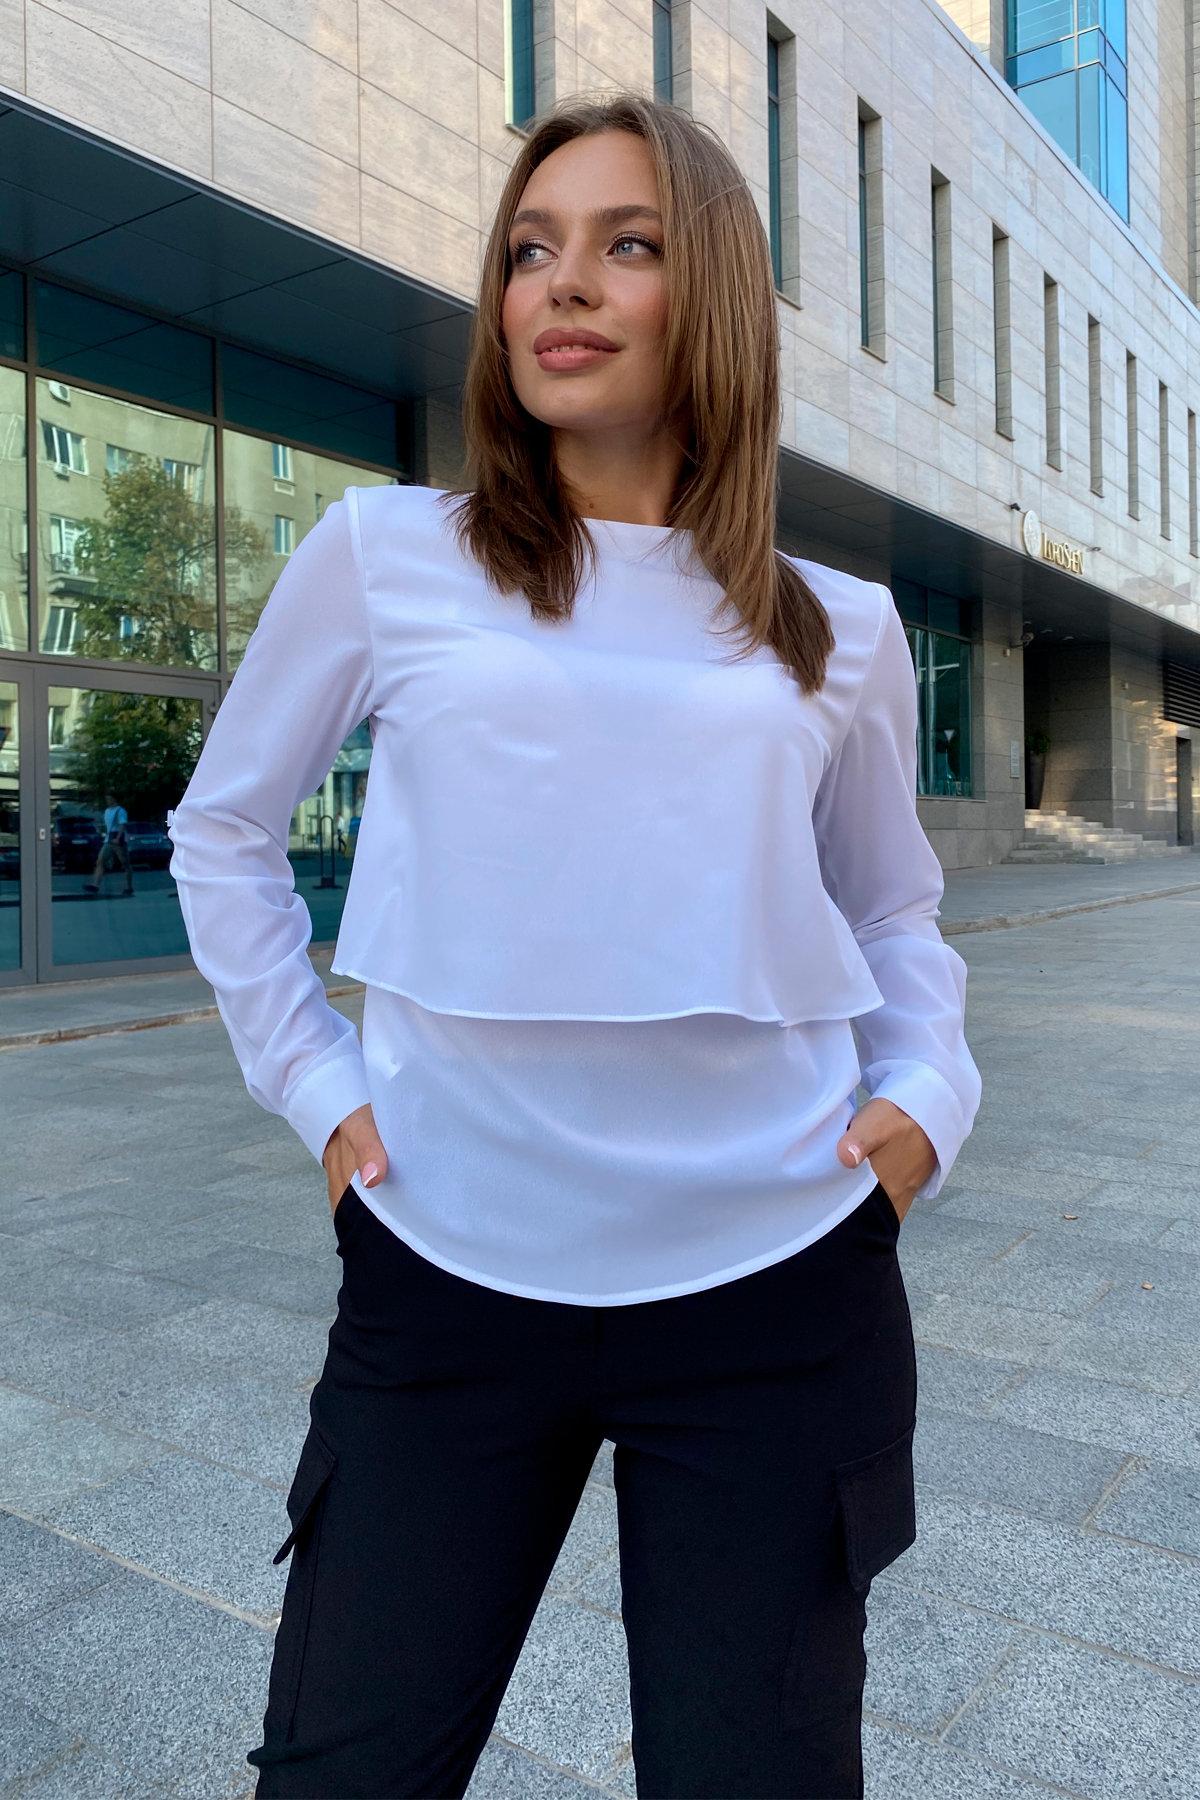 Блузка Ноа лайт 9594 АРТ. 45919 Цвет: Белый - фото 6, интернет магазин tm-modus.ru